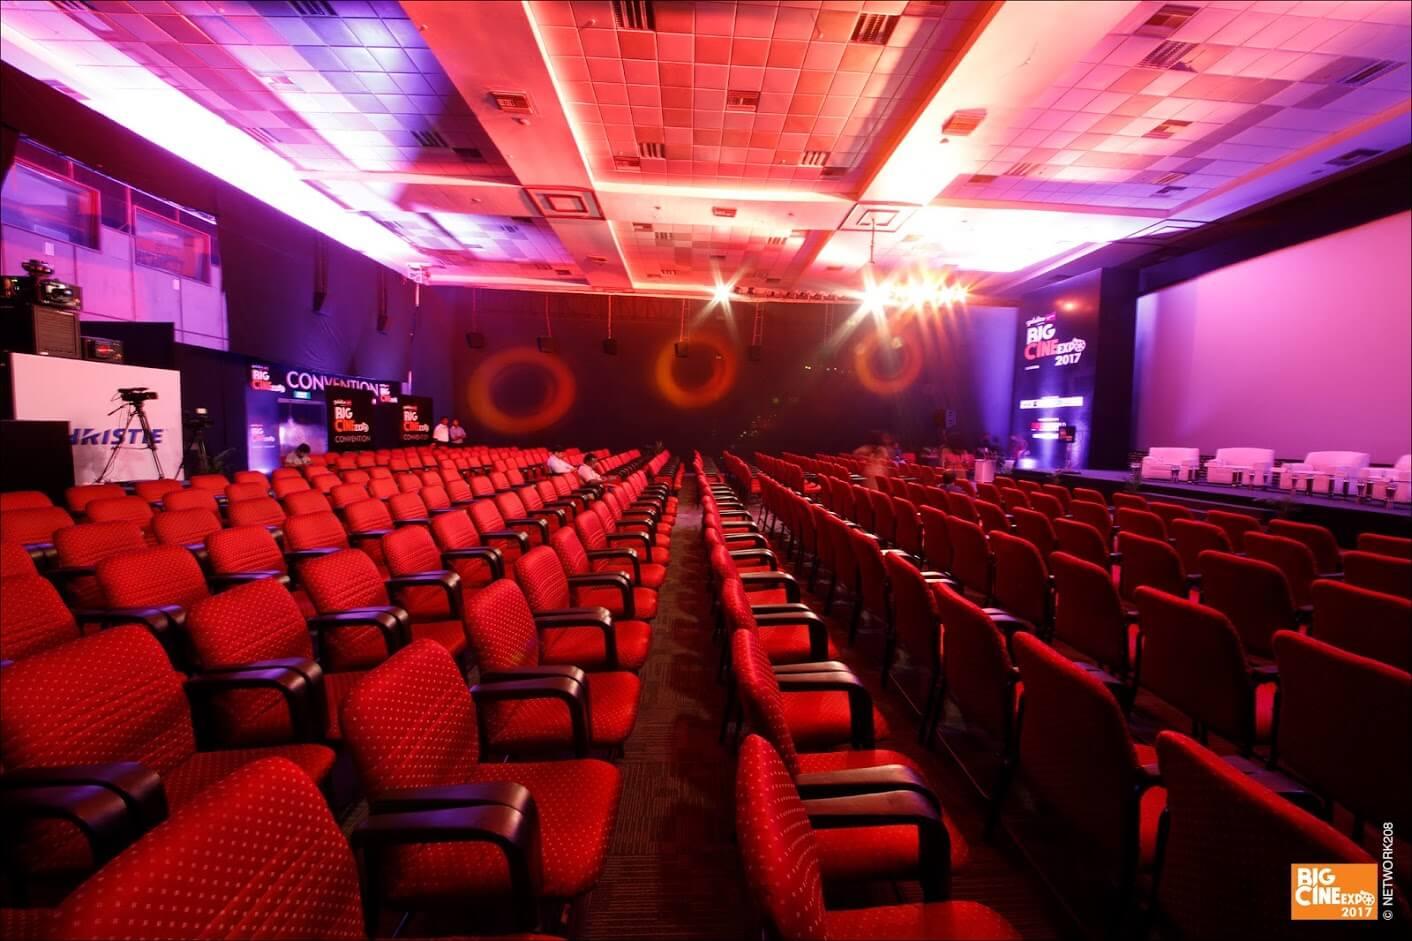 Big Cine Expo 2017